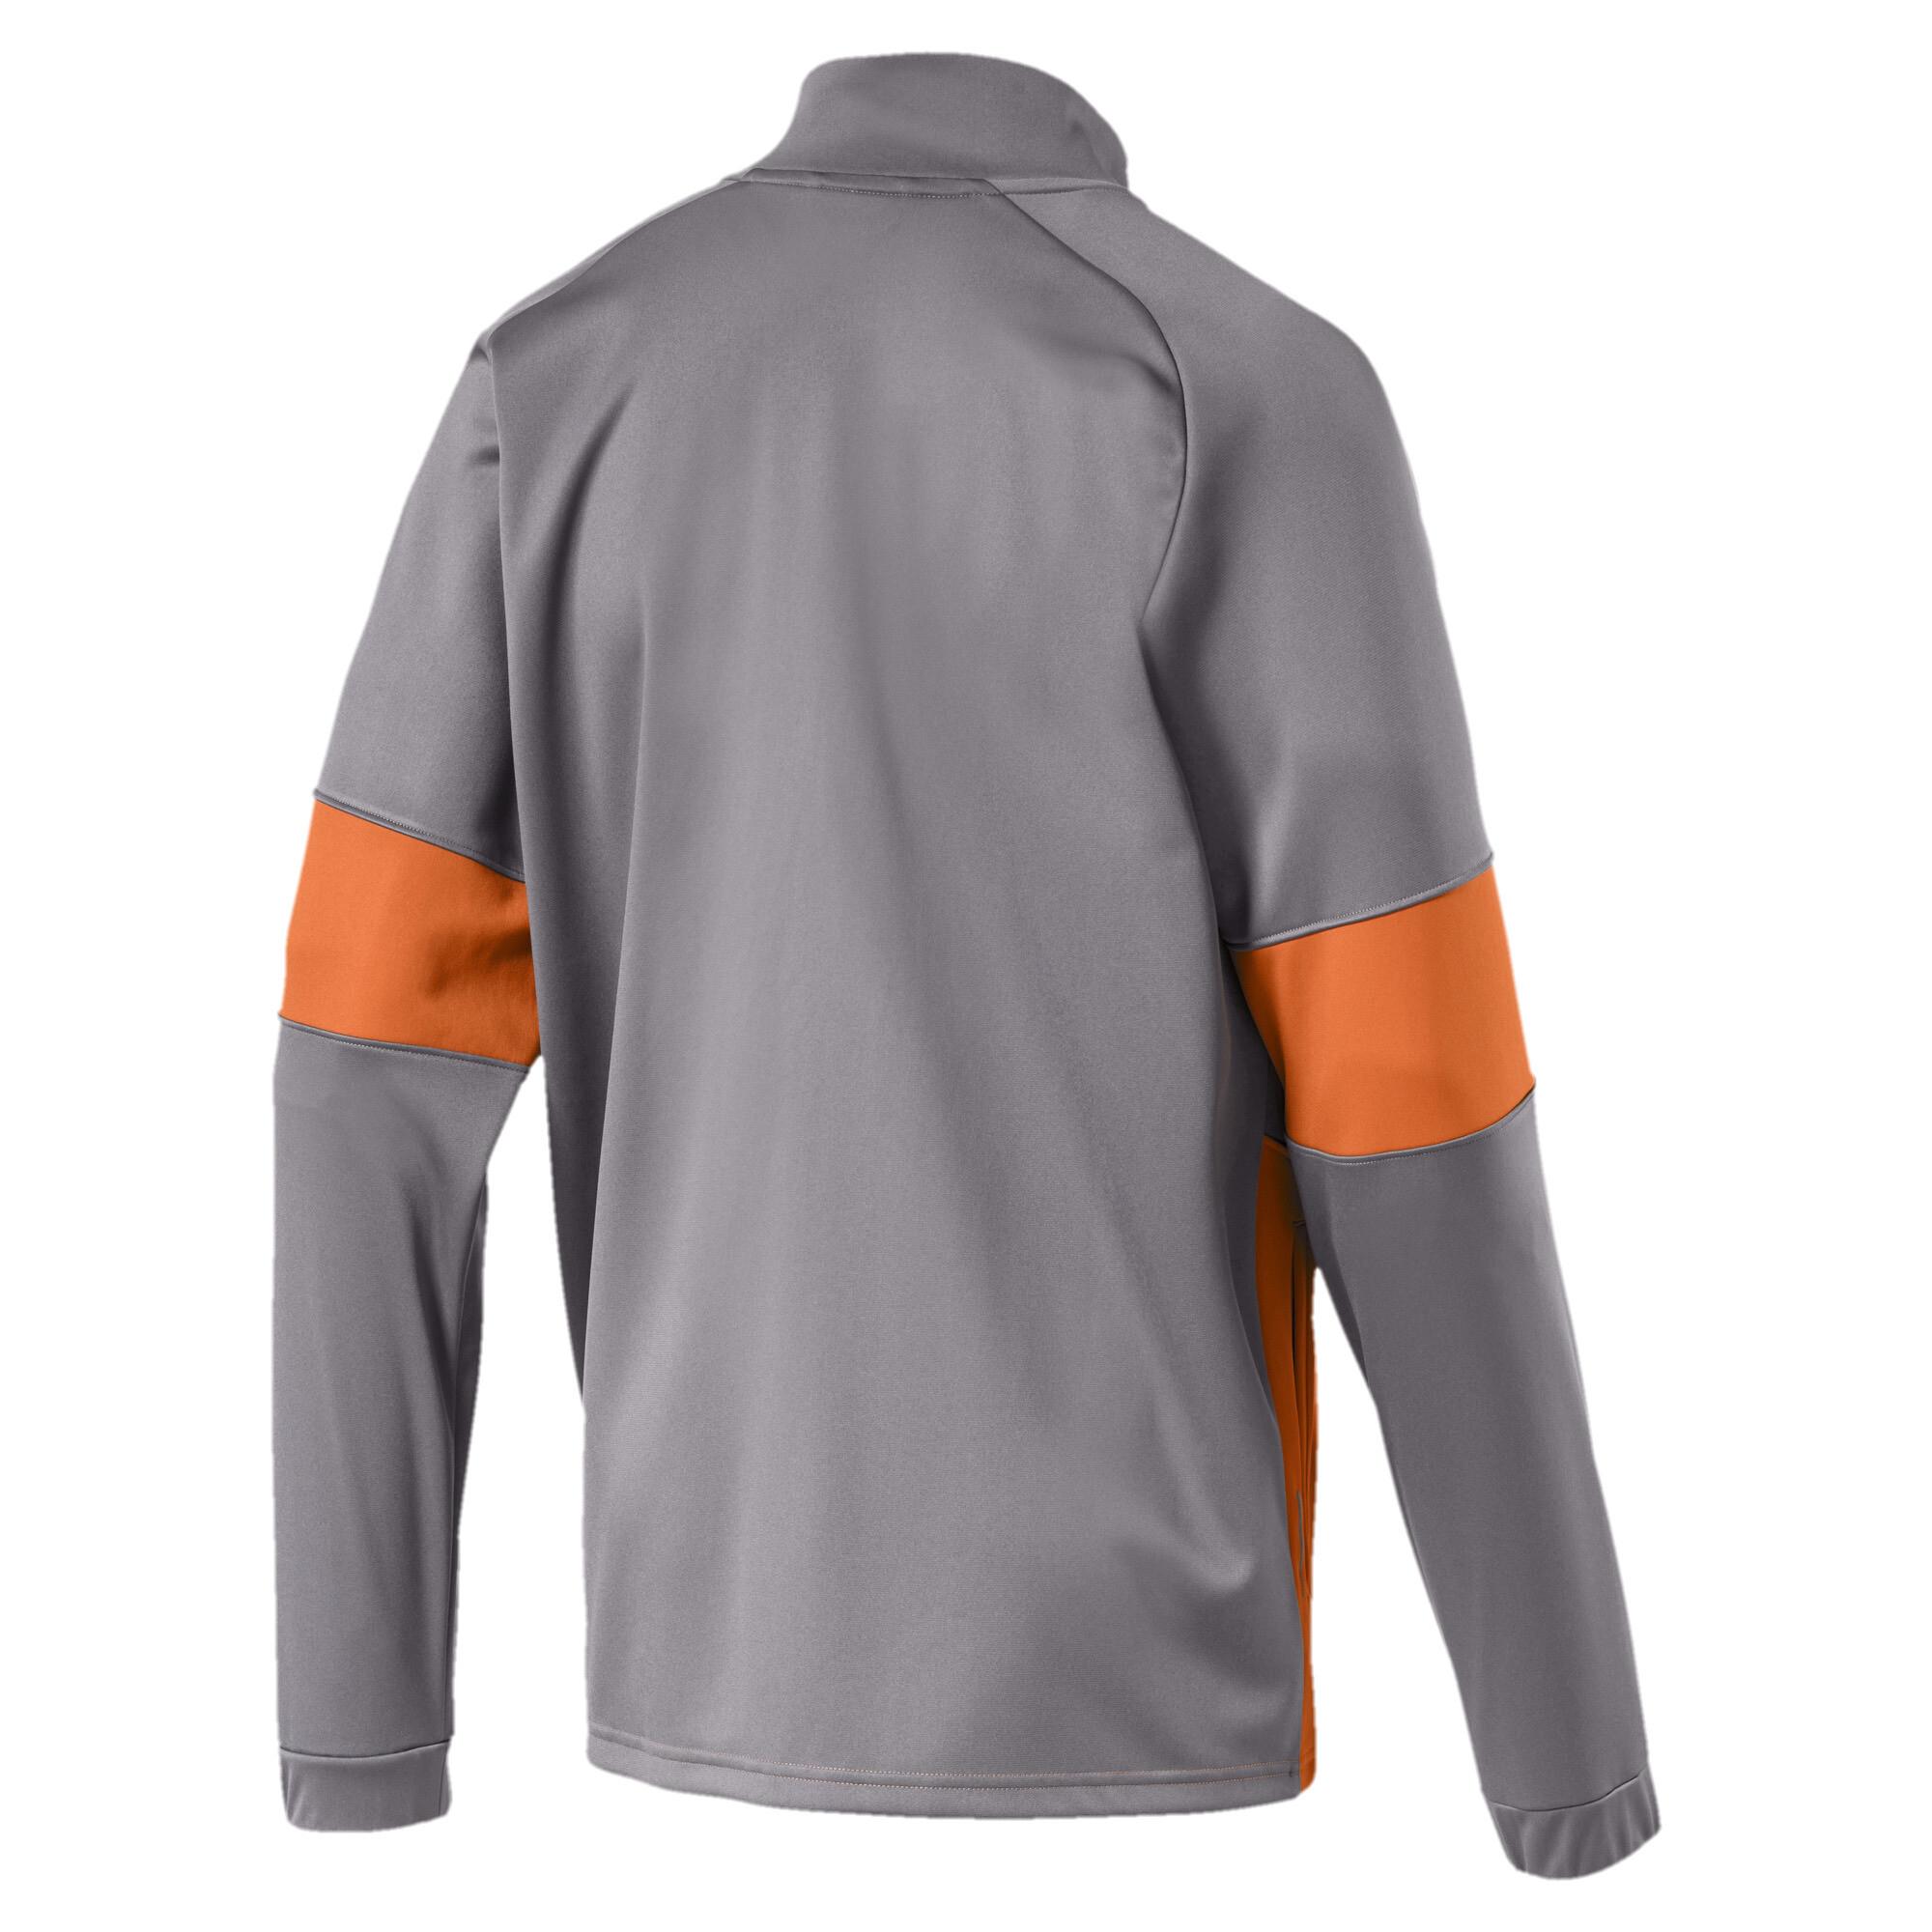 PUMA-PUMA-Blaster-Men-039-s-Jacket-Men-Knitted-Jacket-Training thumbnail 9